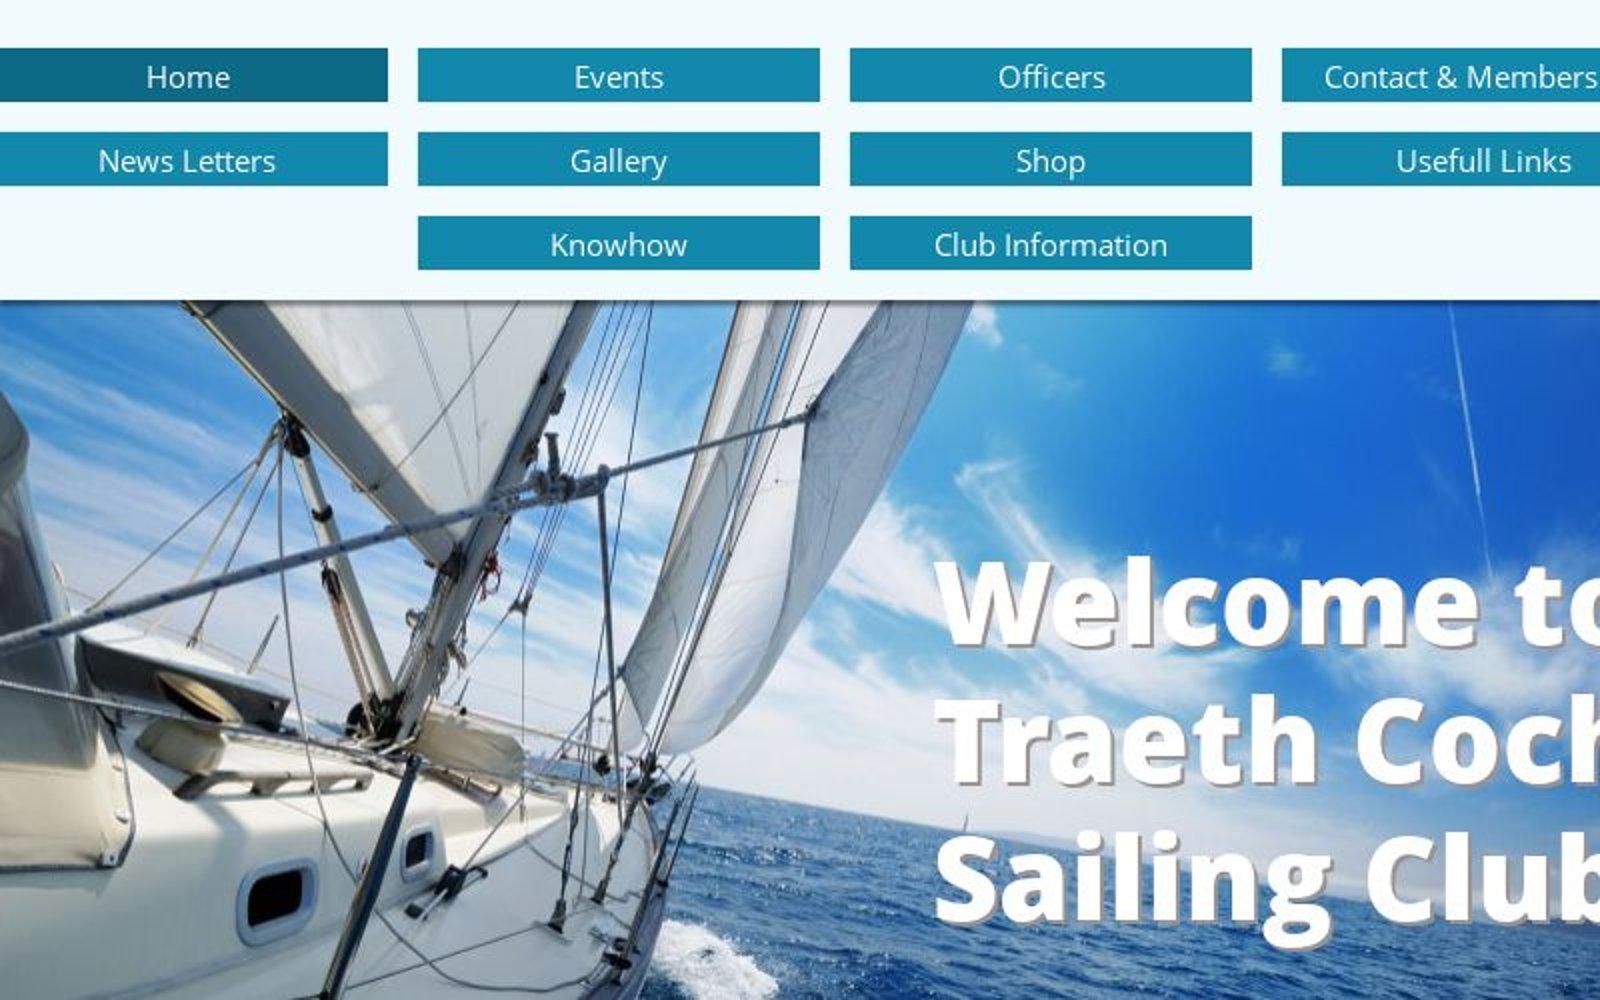 Traeth Coch Sailing Club, Anglesey, North Wales